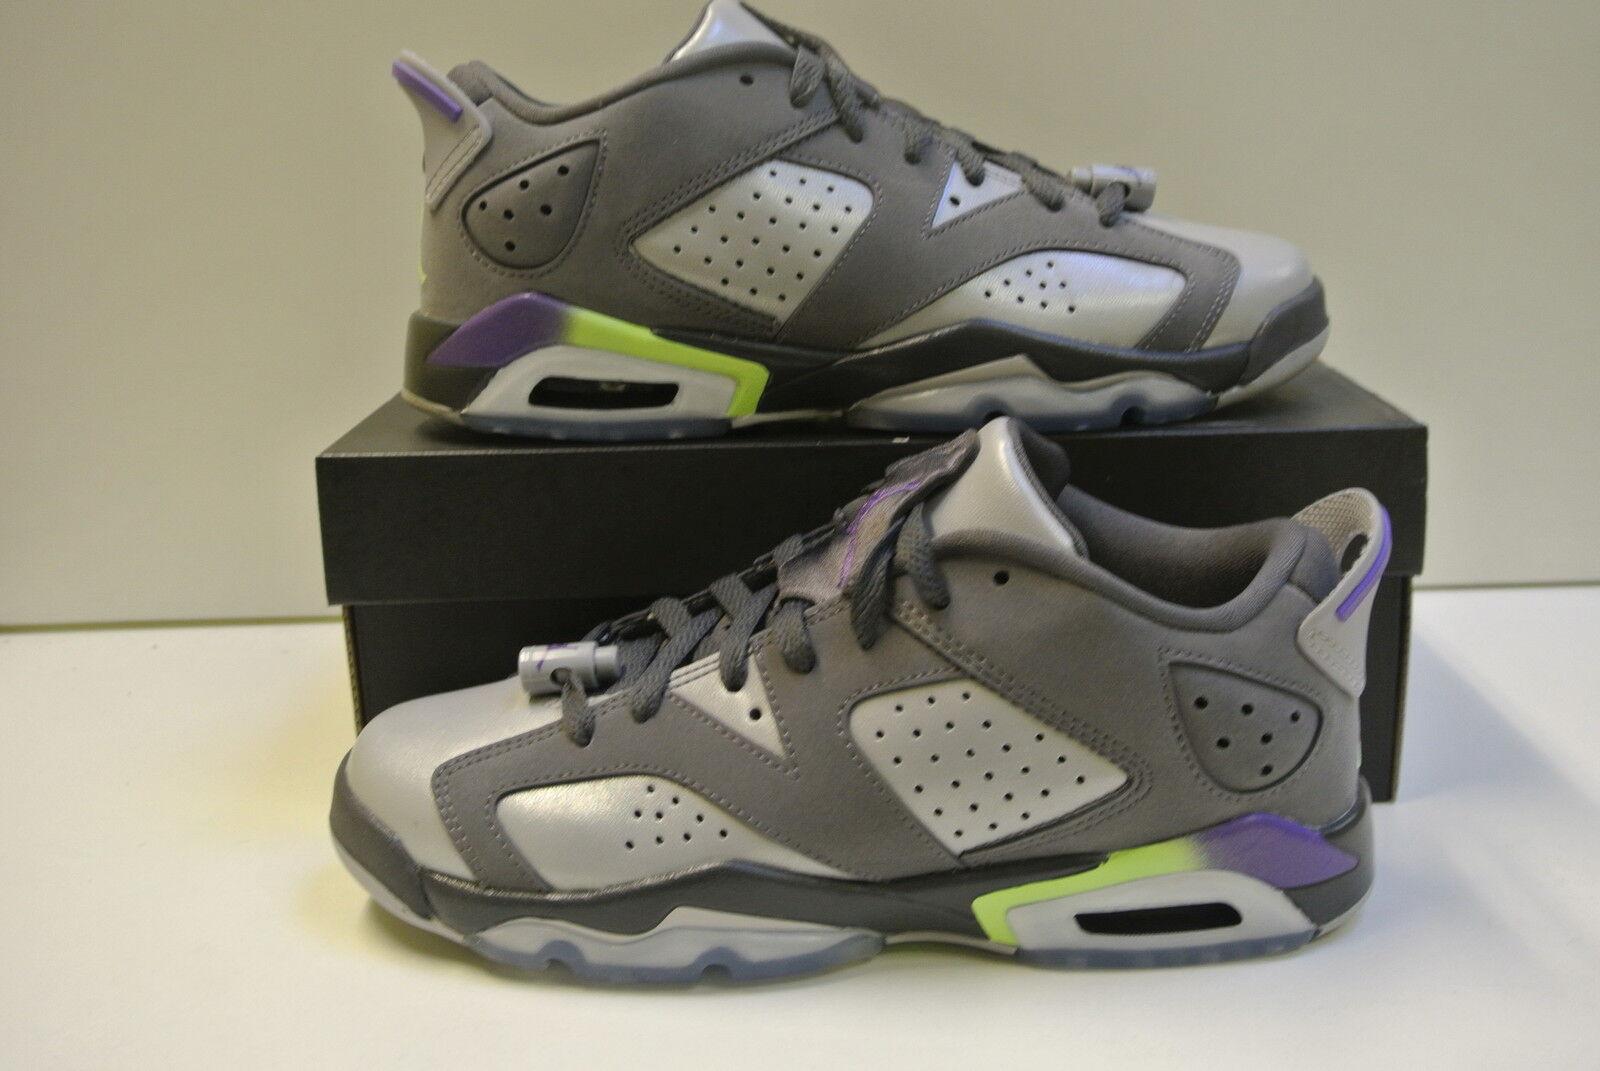 buy online 68288 b472c Nike Air Jordan 6 retro low GG talla elegibles nuevo   OVP 768878 008